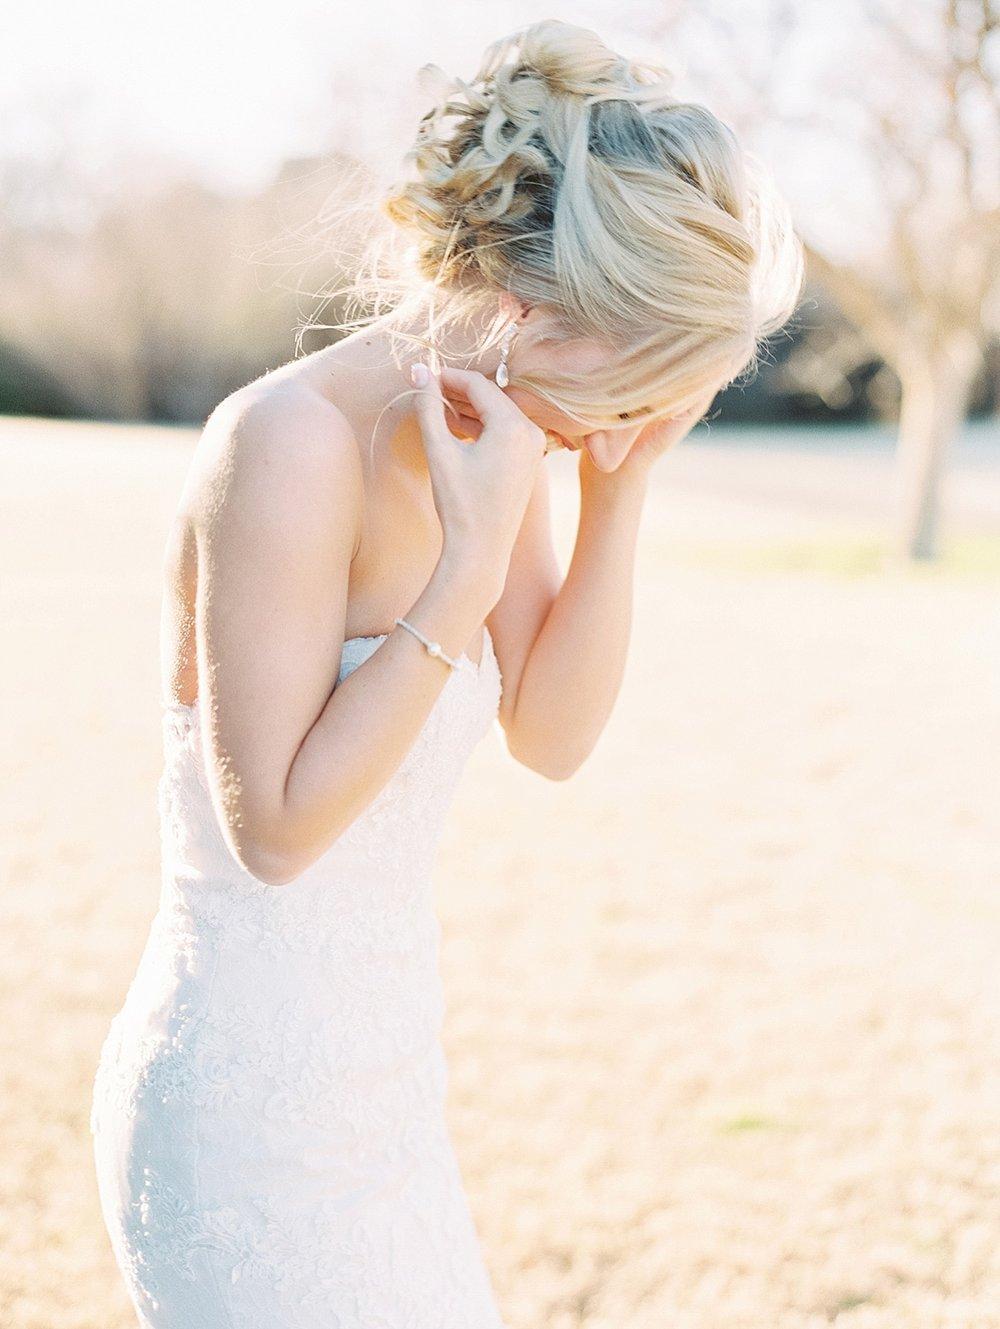 Becca Lea Photography, Fine art film wedding photographer, Contax 645, Fuji 400h, Portra 400, Film Photographer, Fine Art Wedding Photographer, Dallas Wedding Photographers, Dallas Wedding, D Weddings, Dallas brides, Candelaria Designs, Brides Amarillo